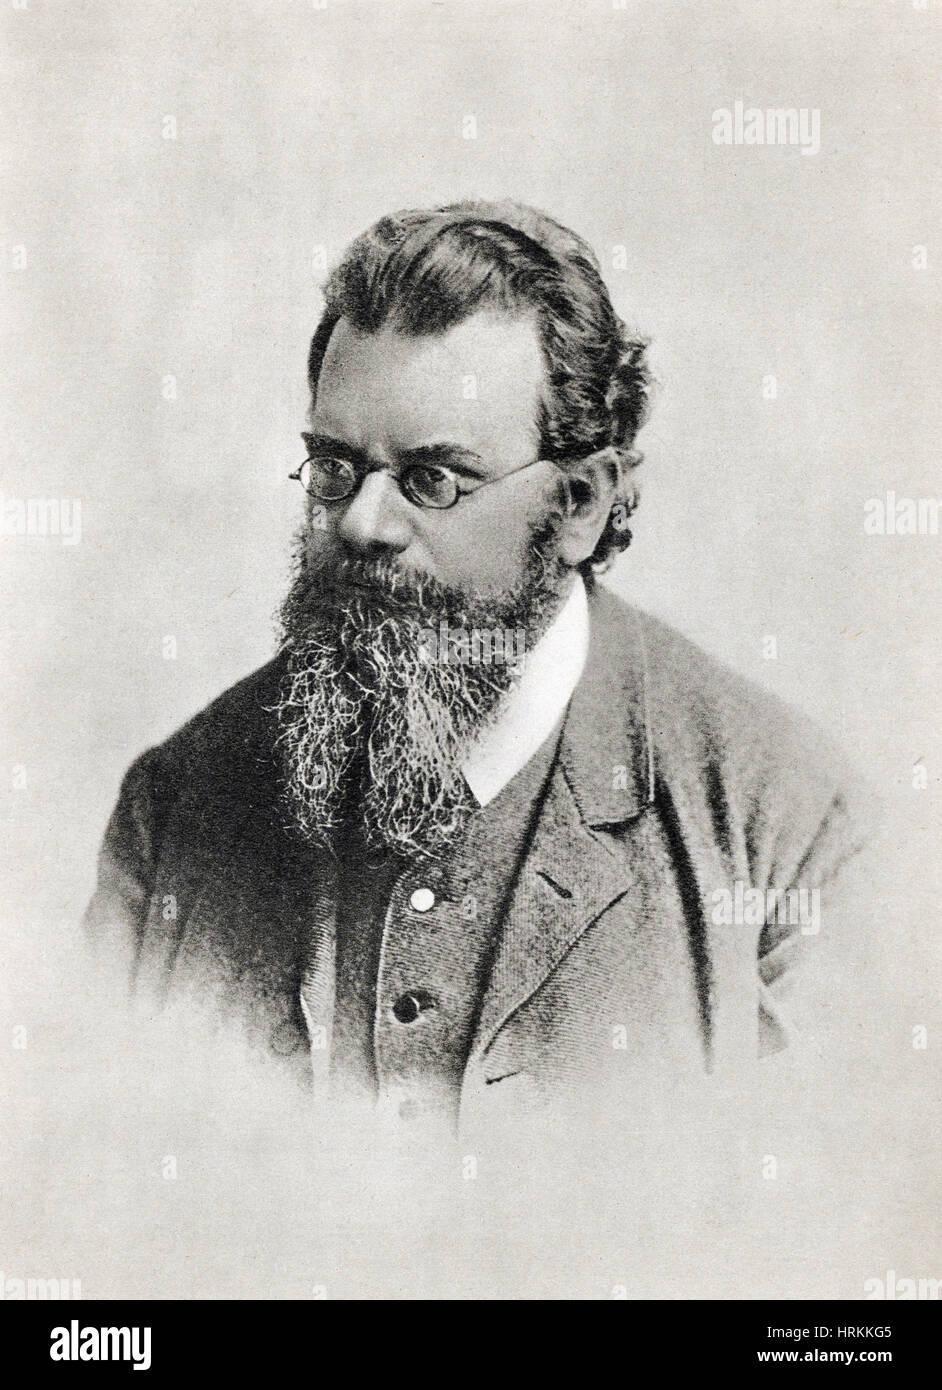 Ludwig Boltzmann, Austrian Physicist - Stock Image